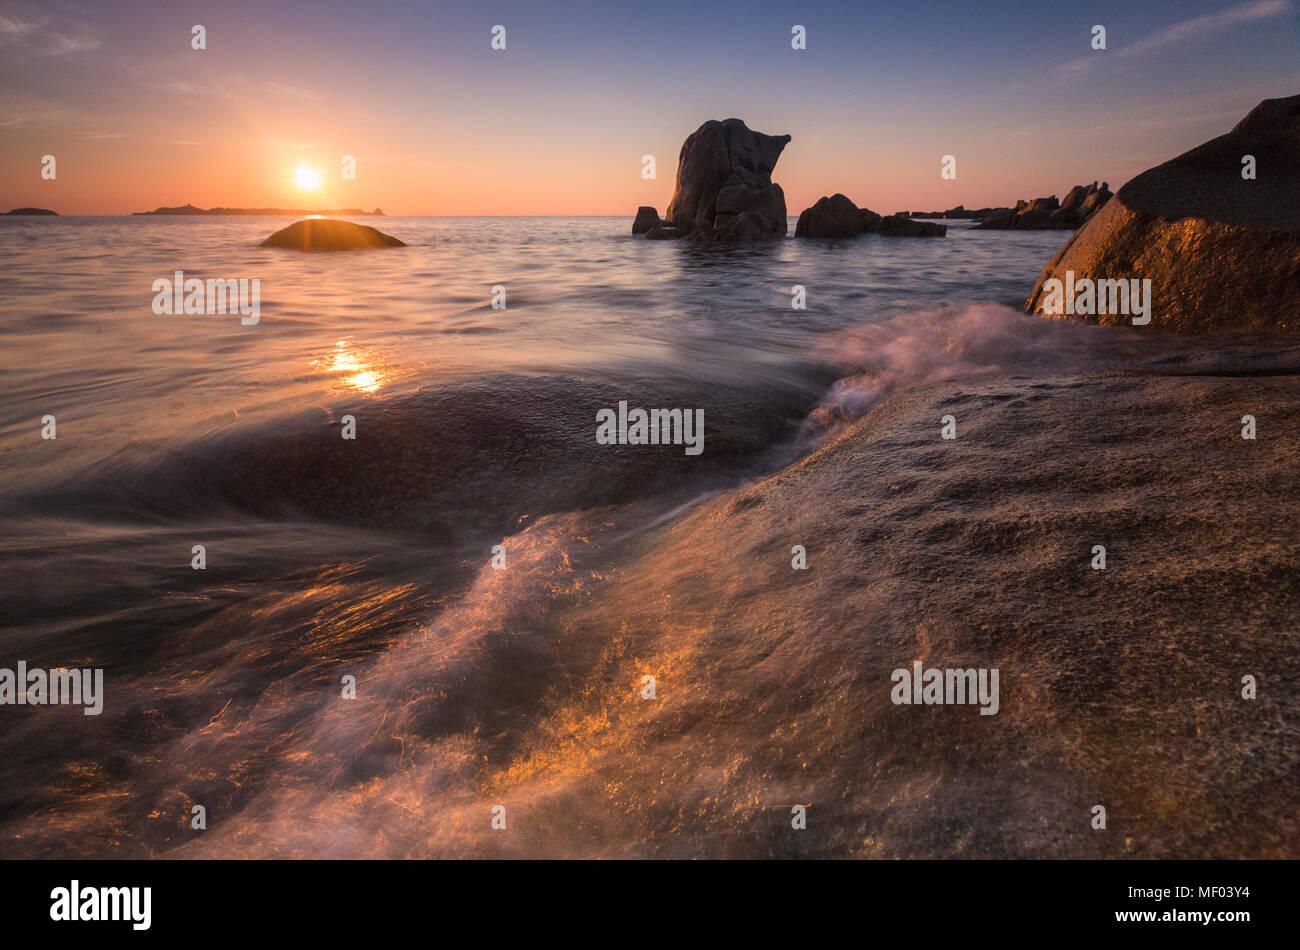 Waves crashing on cliffs under the fiery sky at sunrise Punta Molentis Villasimius Cagliari Sardinia Italy Europe Stock Photo